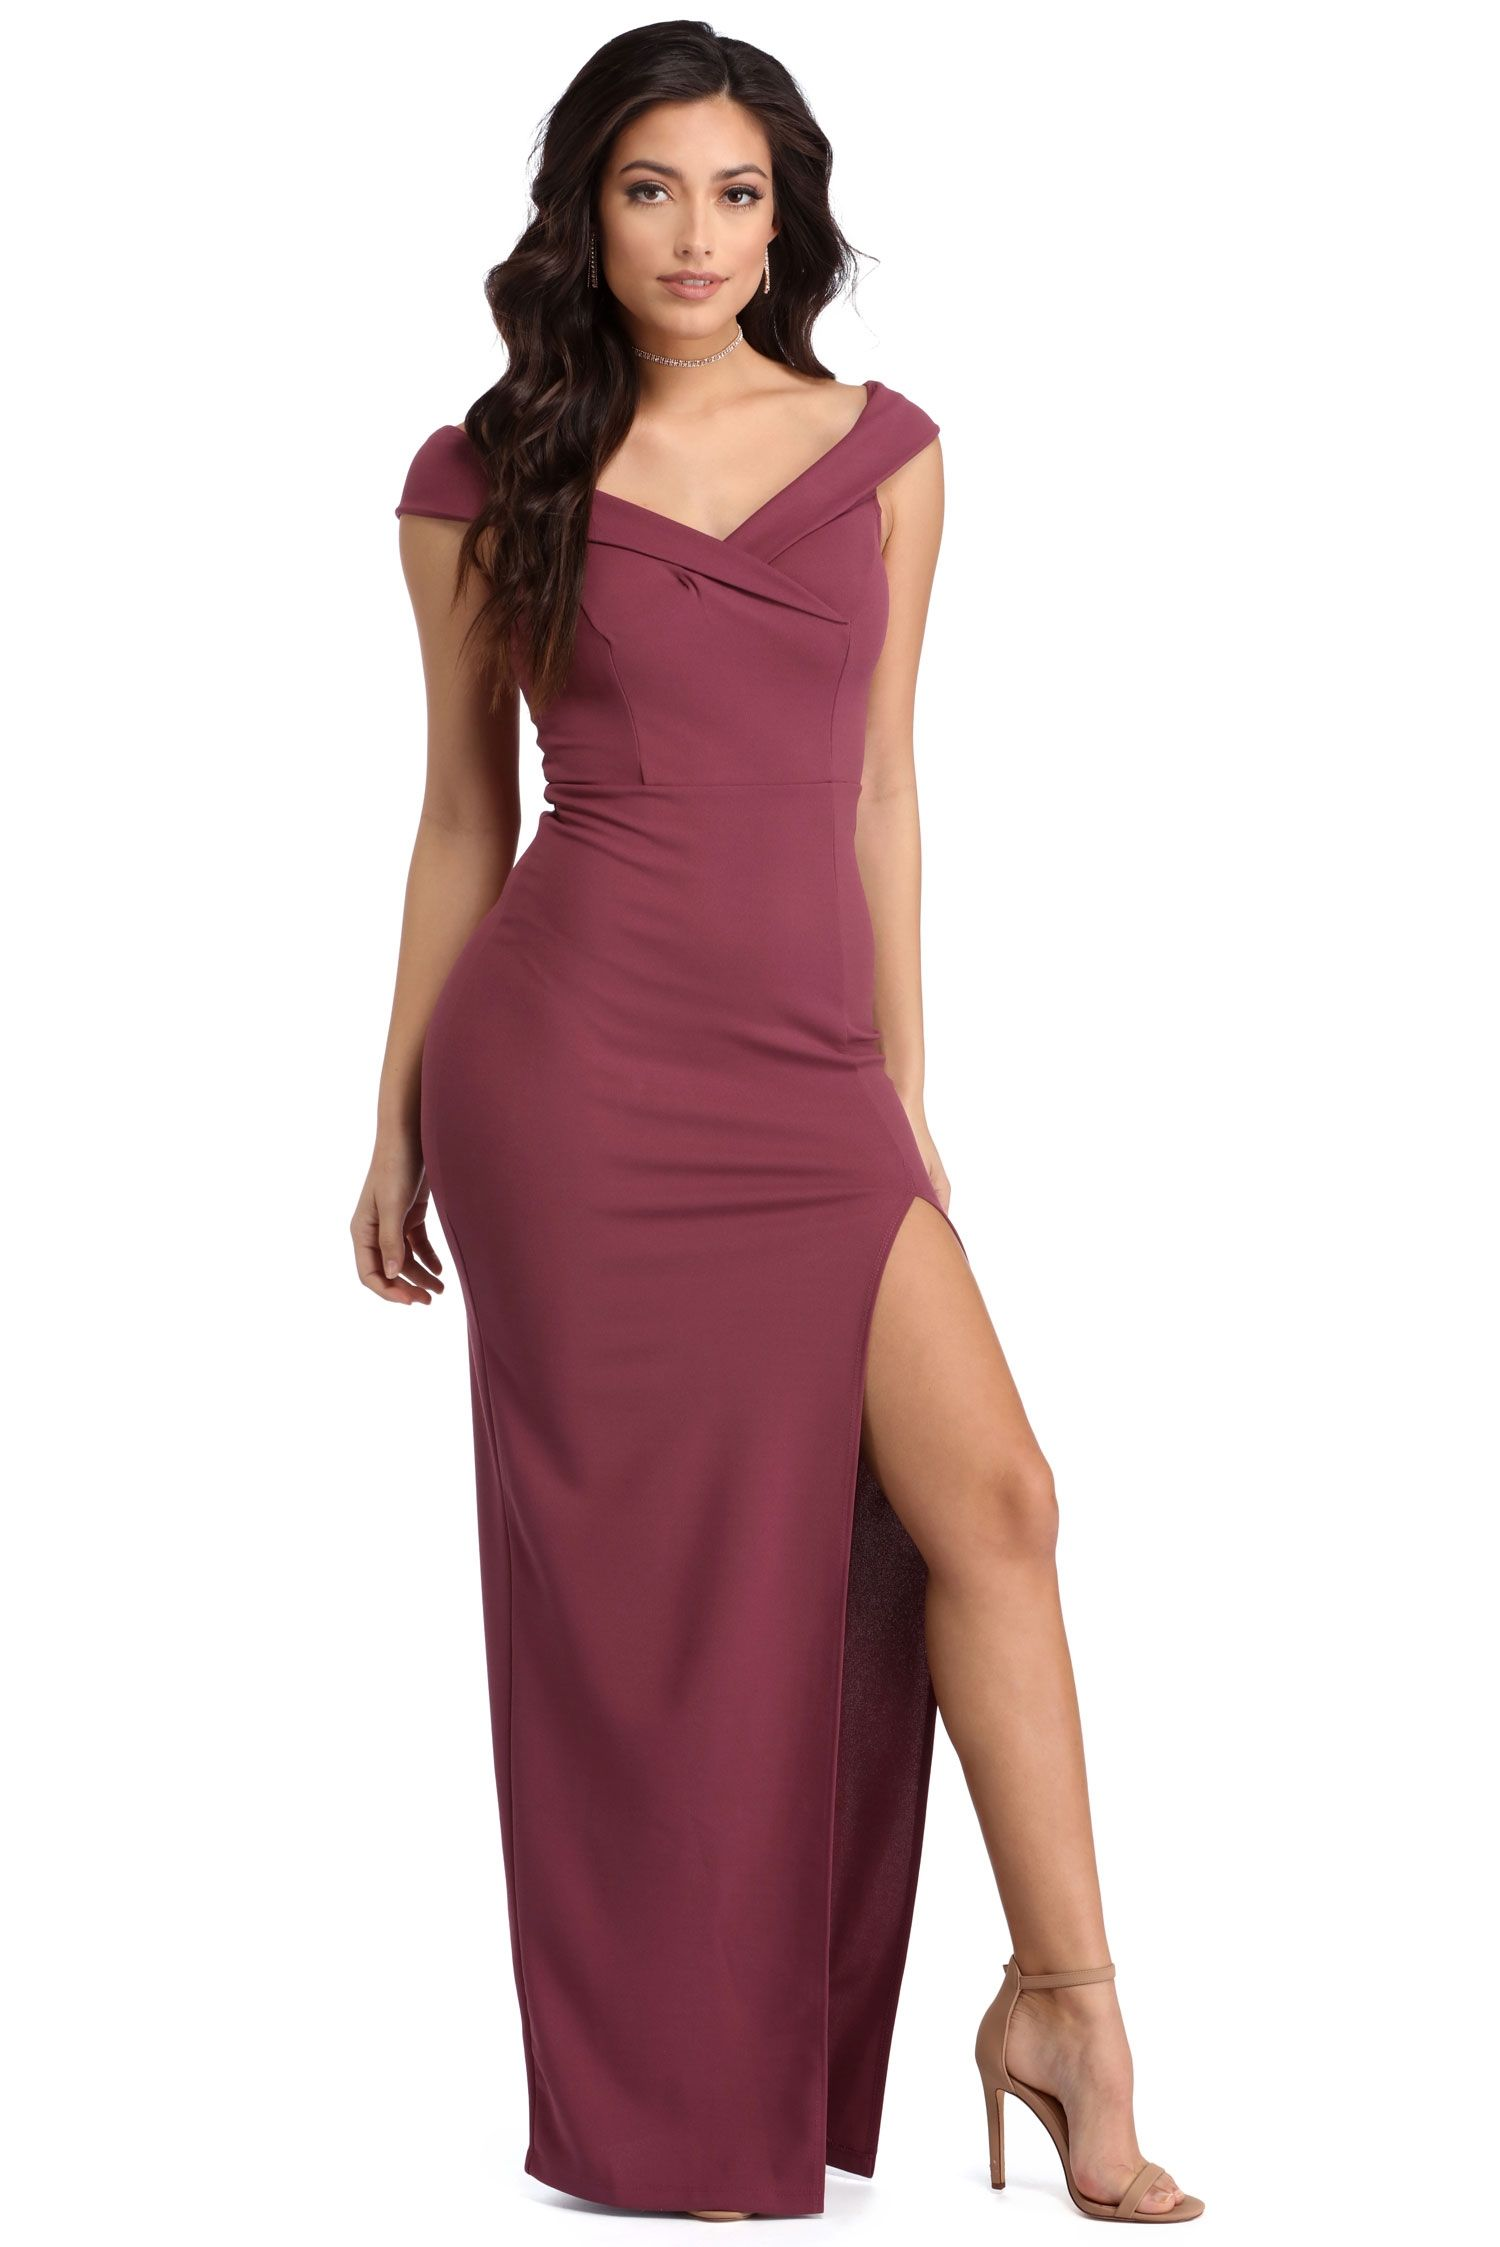 Elle Mauve Off The Shoulder Dress prom Pinterest Prom dresses